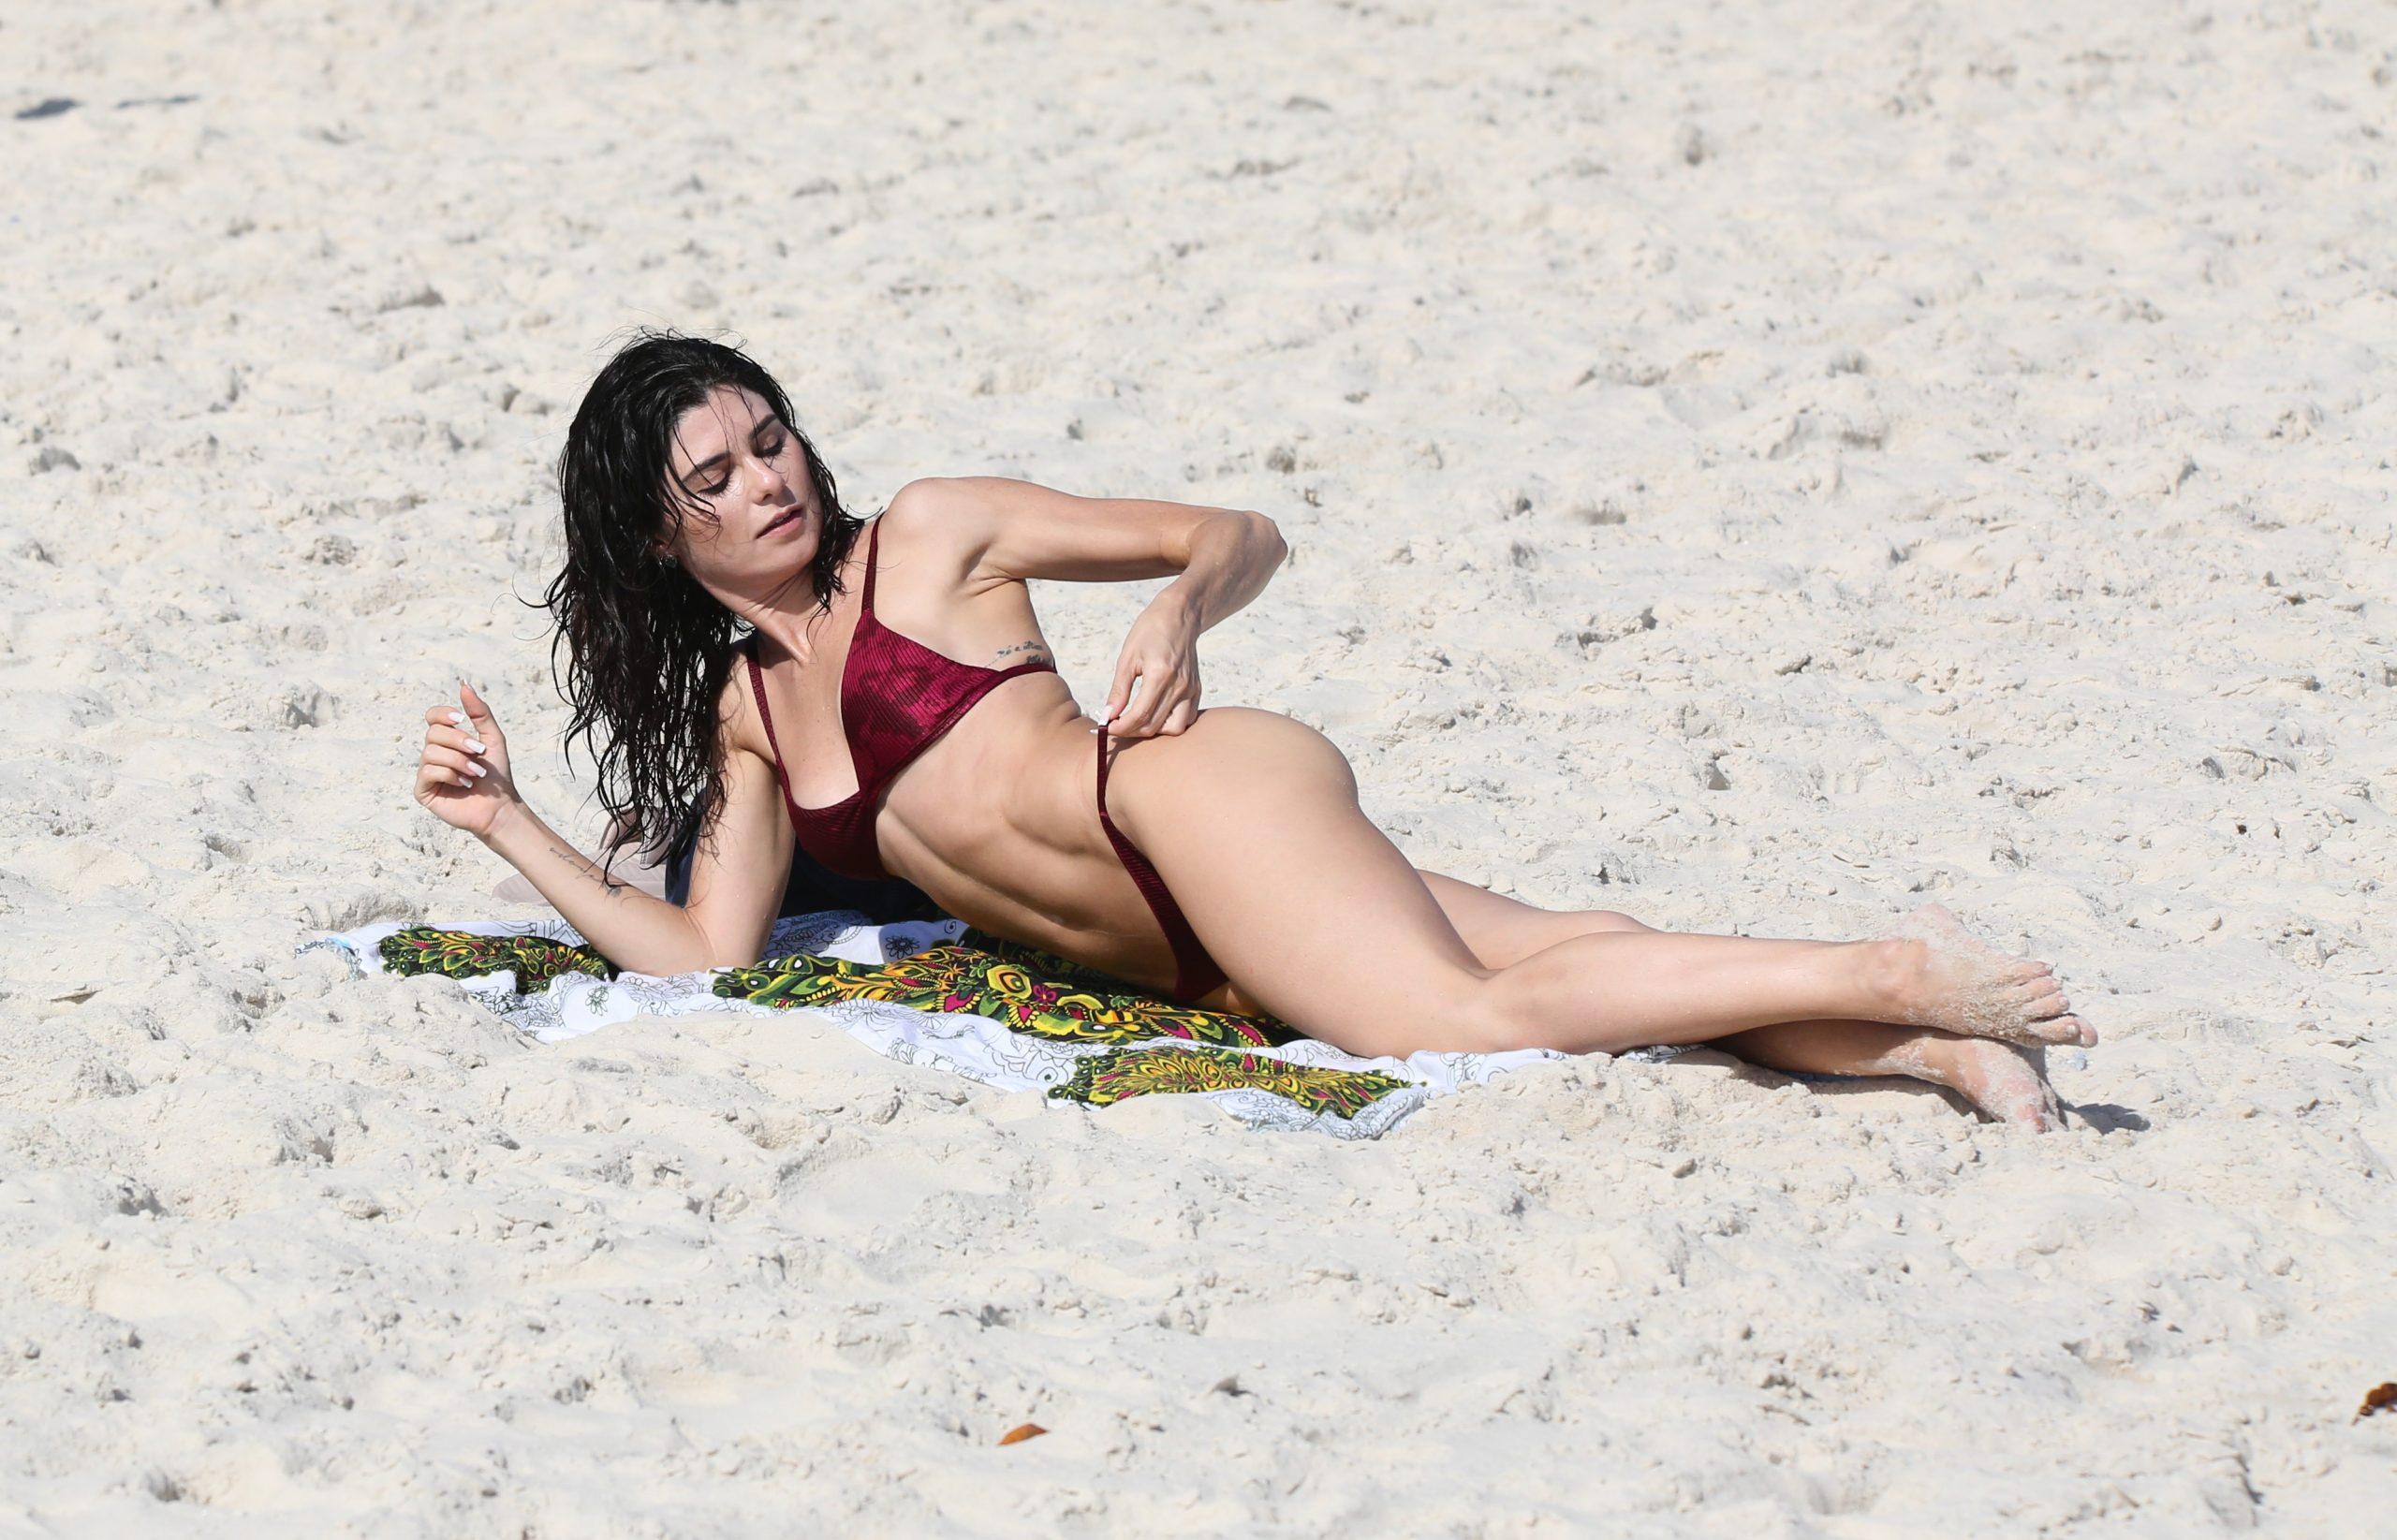 Julianne Trevisol impressiona com barriga chapada em tarde de praia